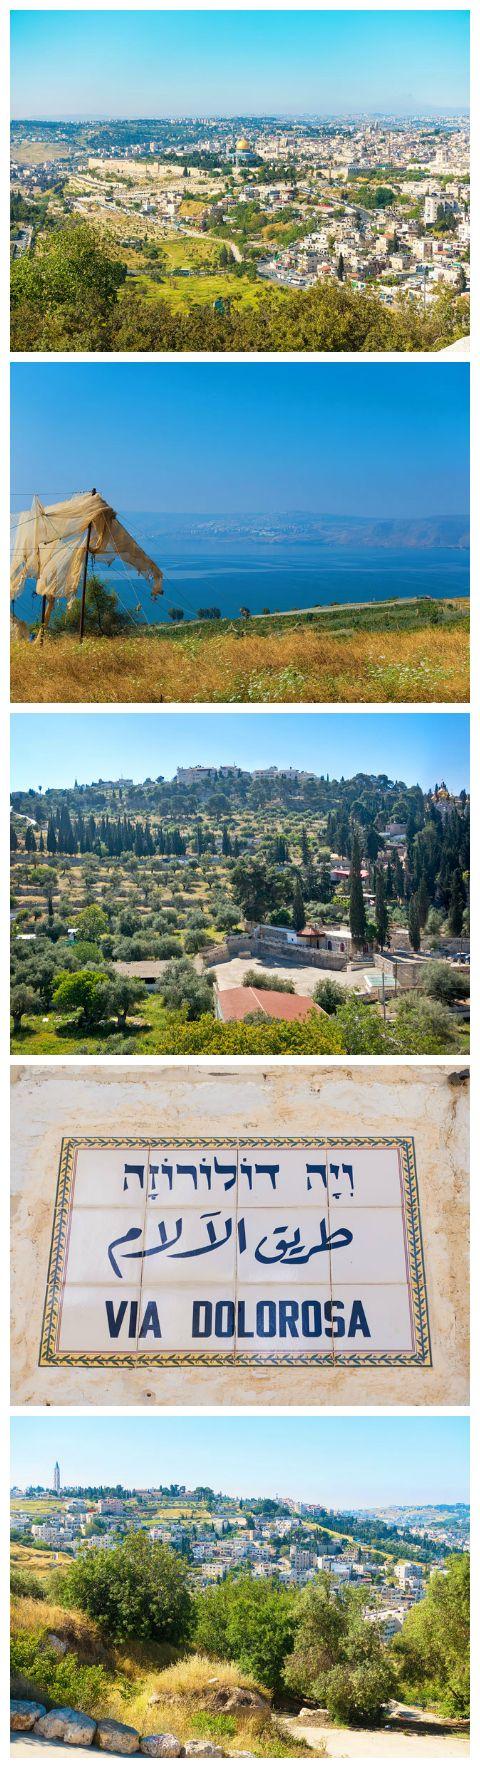 best 25 sea of galilee ideas on pinterest israel trip holy